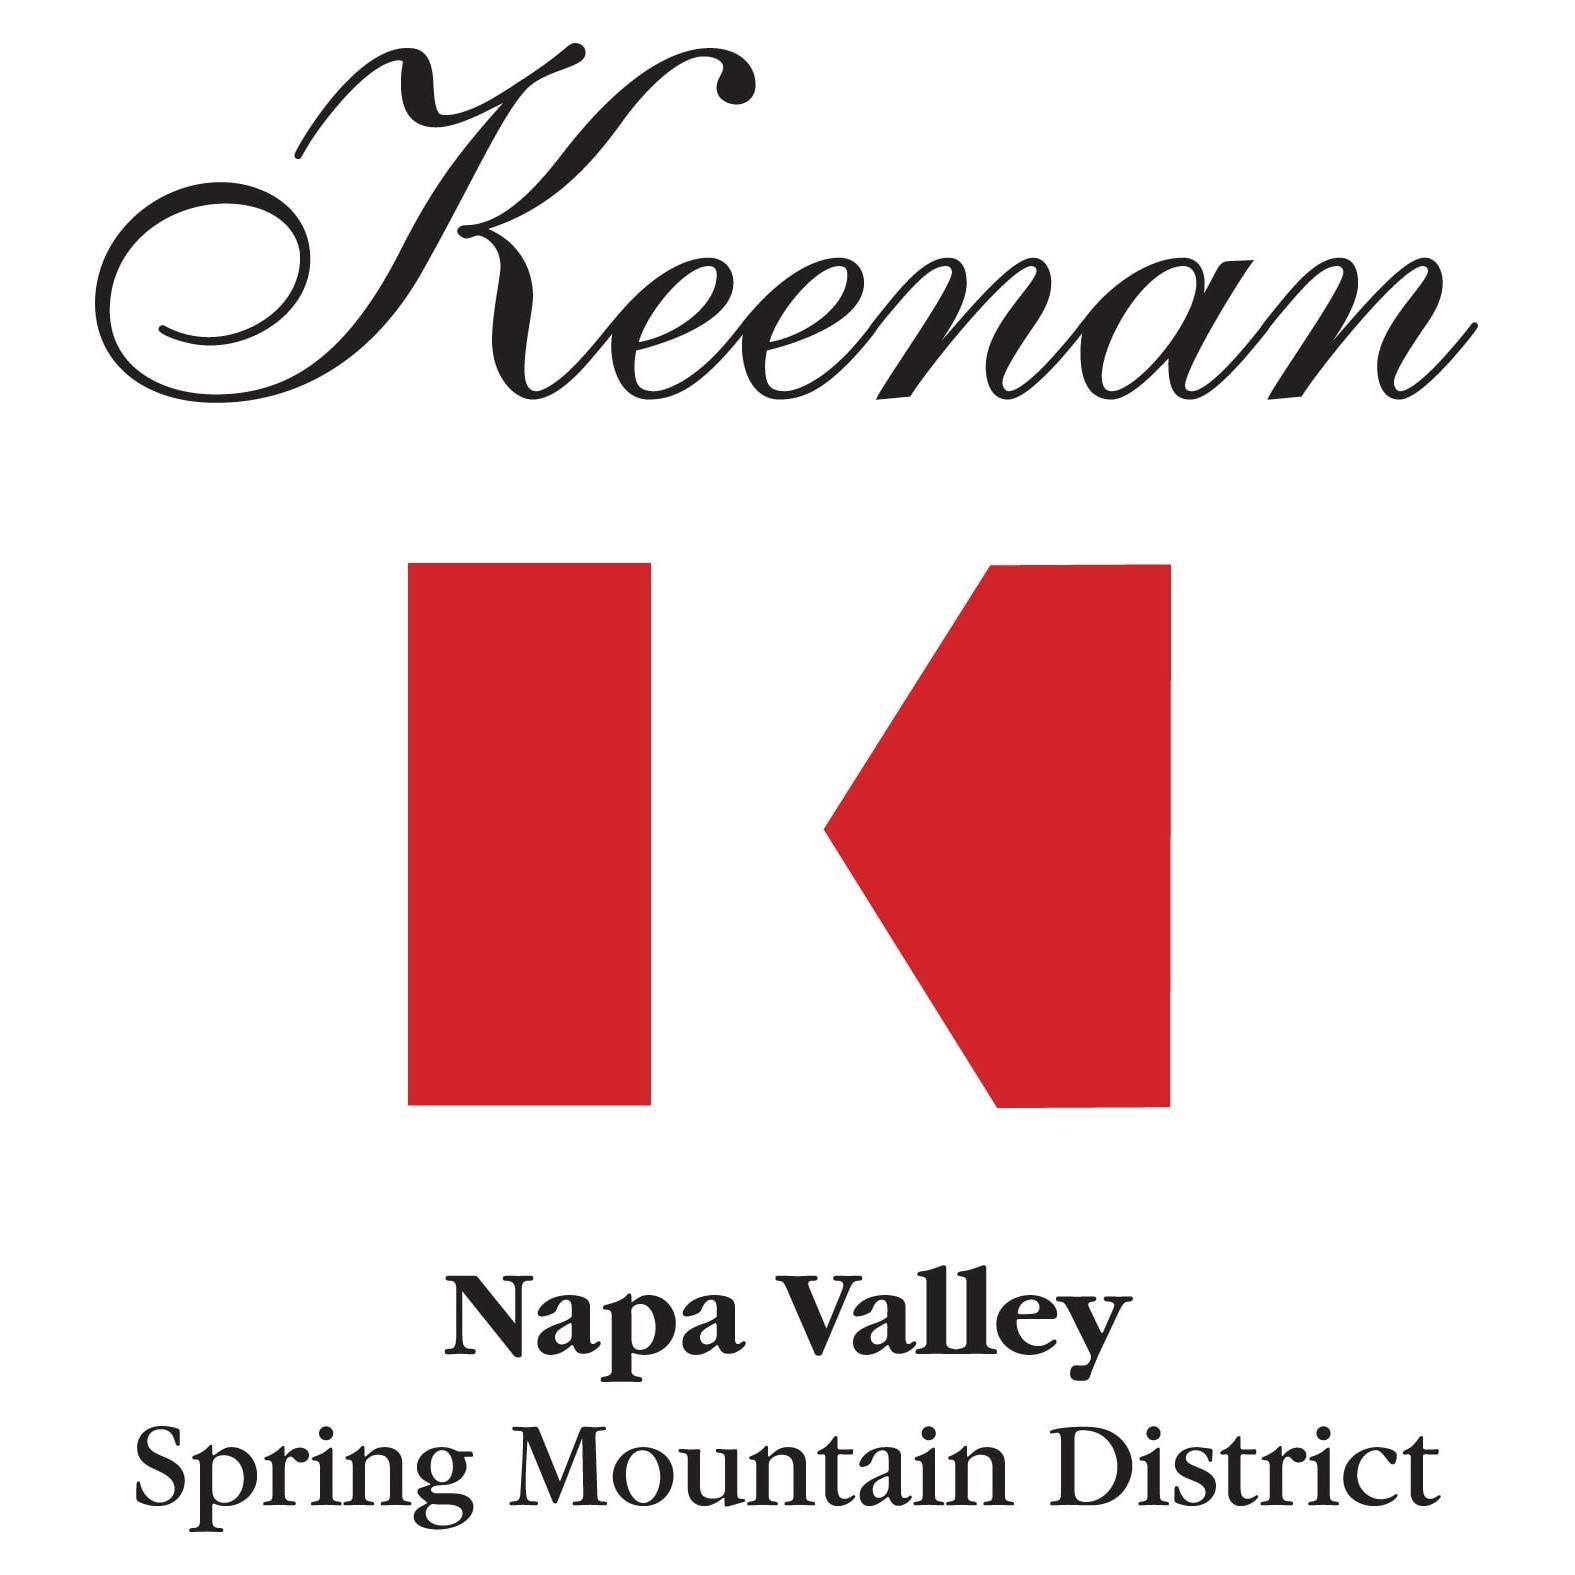 Robert Keenan Winery - St. Helena, CA - Liquor Stores